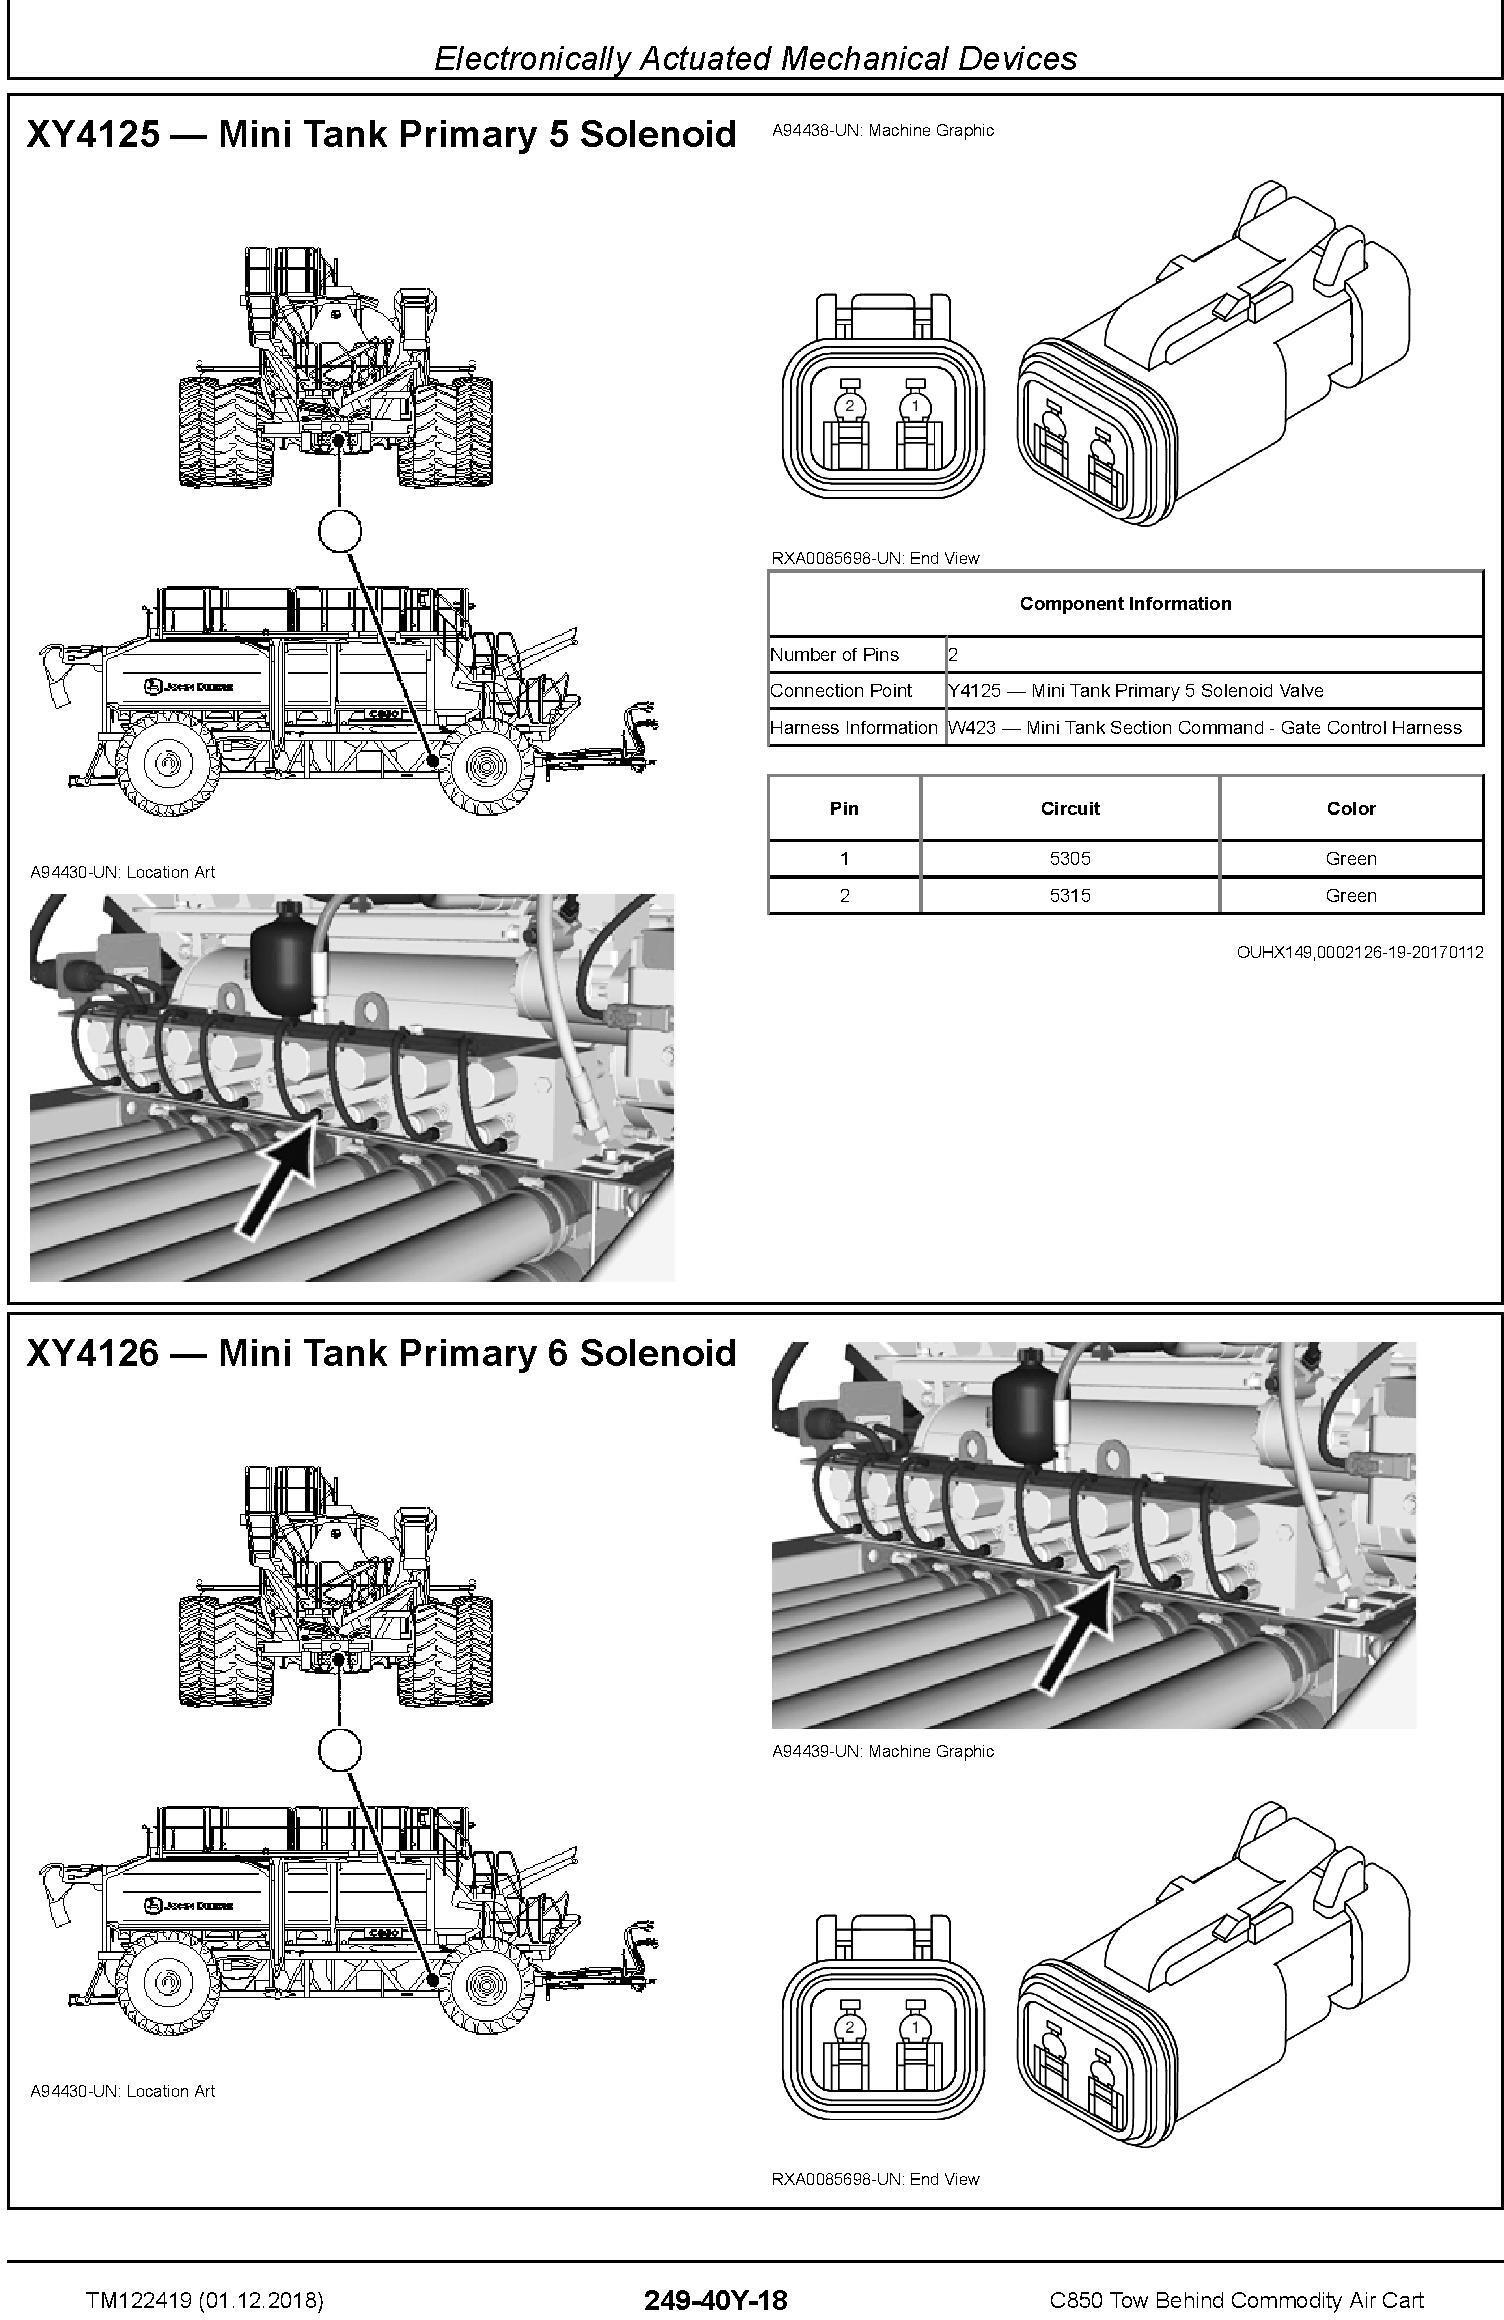 John Deere C850 Tow Behind Commodity Air Cart Diagnostic Technical Manual (TM122419) - 1